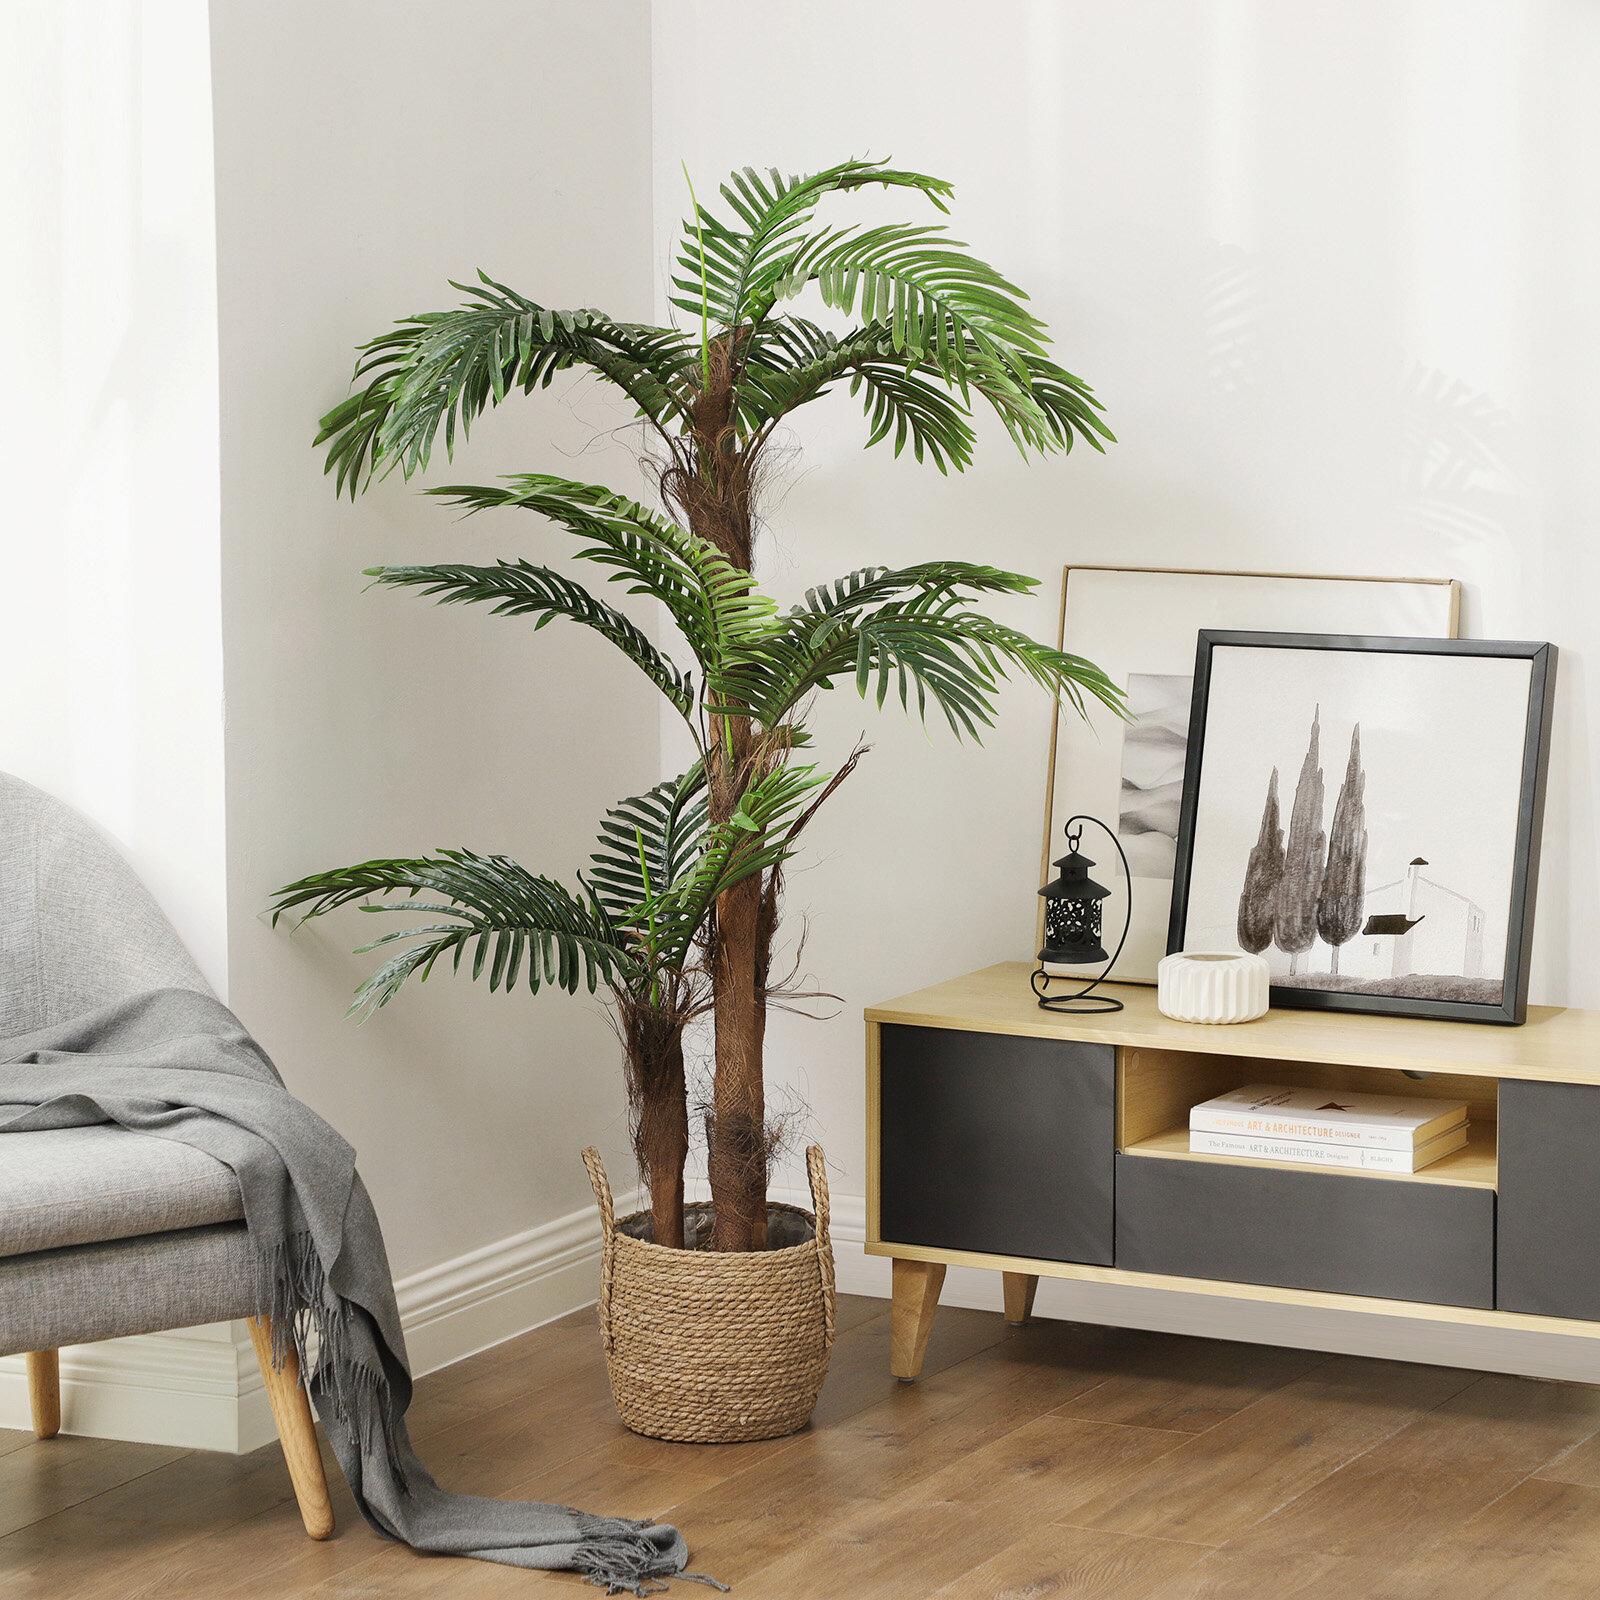 Primrue 55 Artificial Palm Tree In Pot Reviews Wayfair